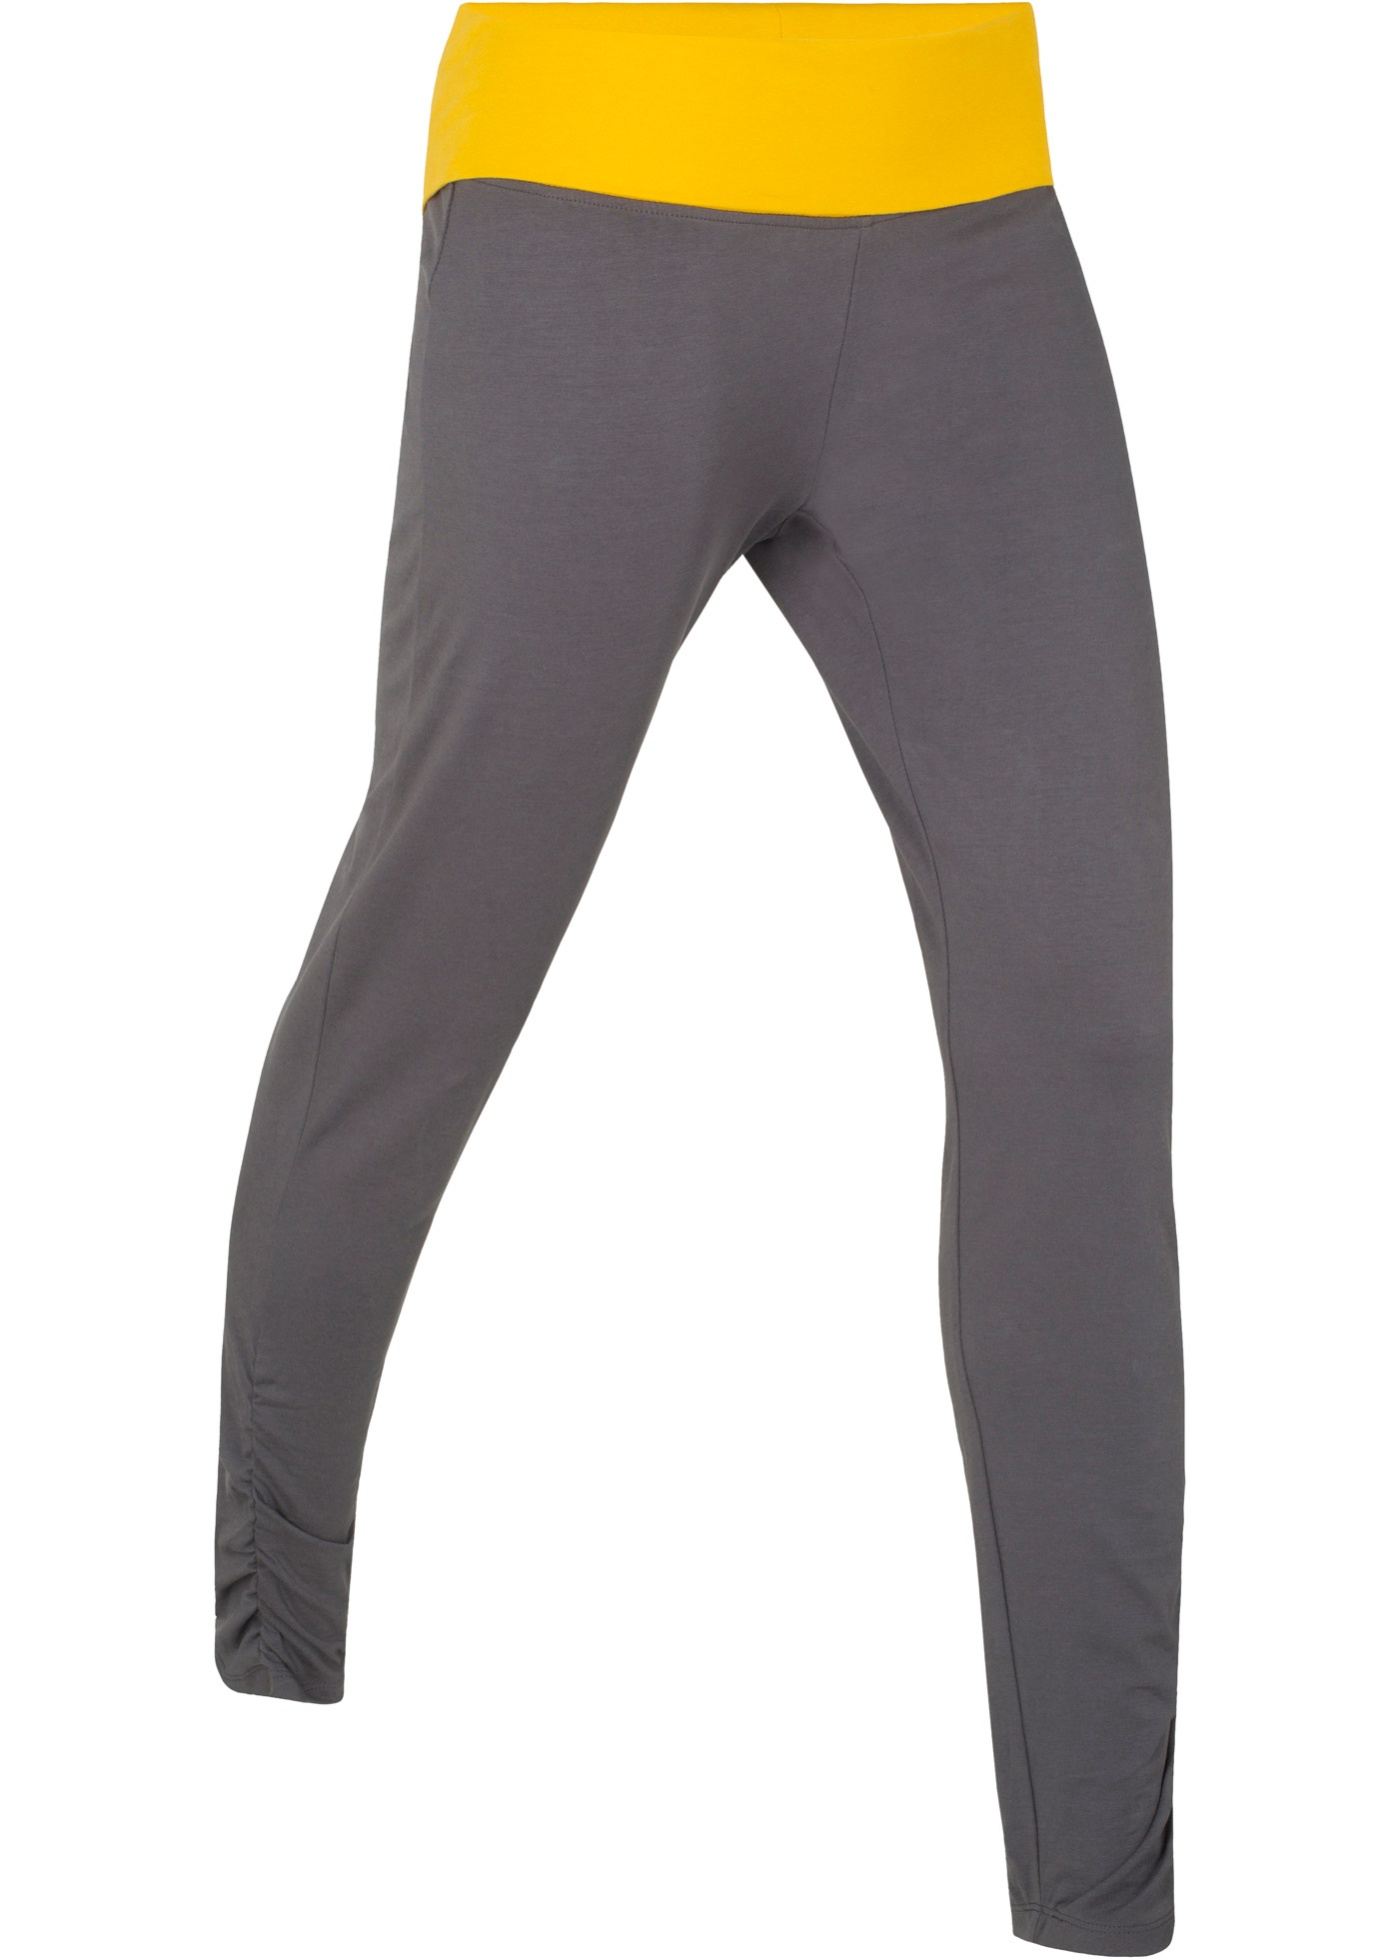 Pantalon fluide, niveau 1, designed by Maite Kelly